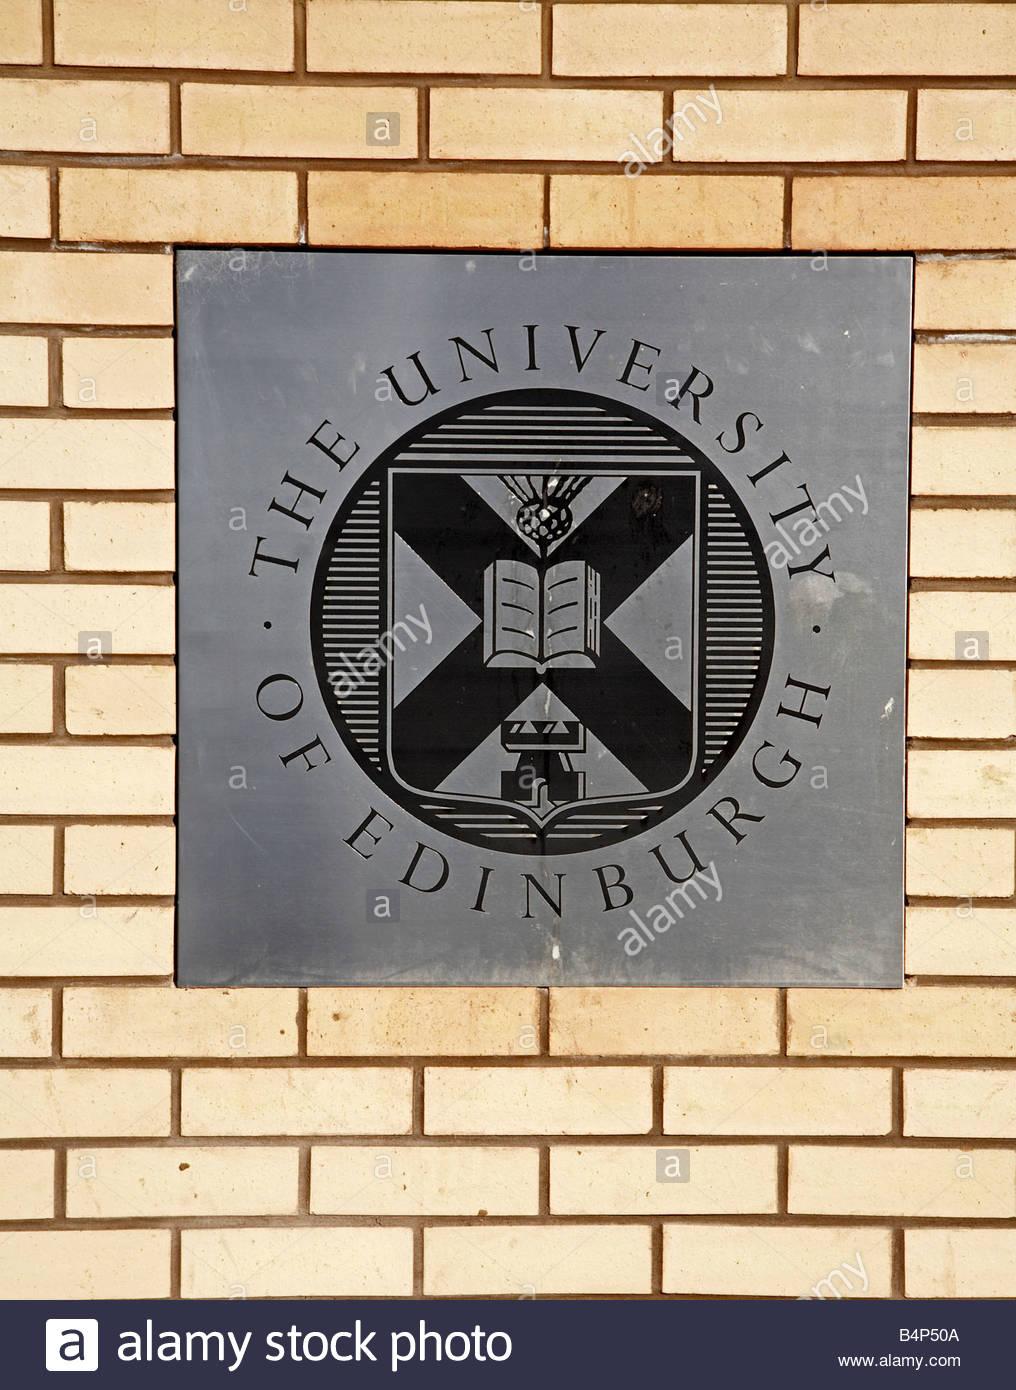 Edinburgh University coat of Arms - Stock Image